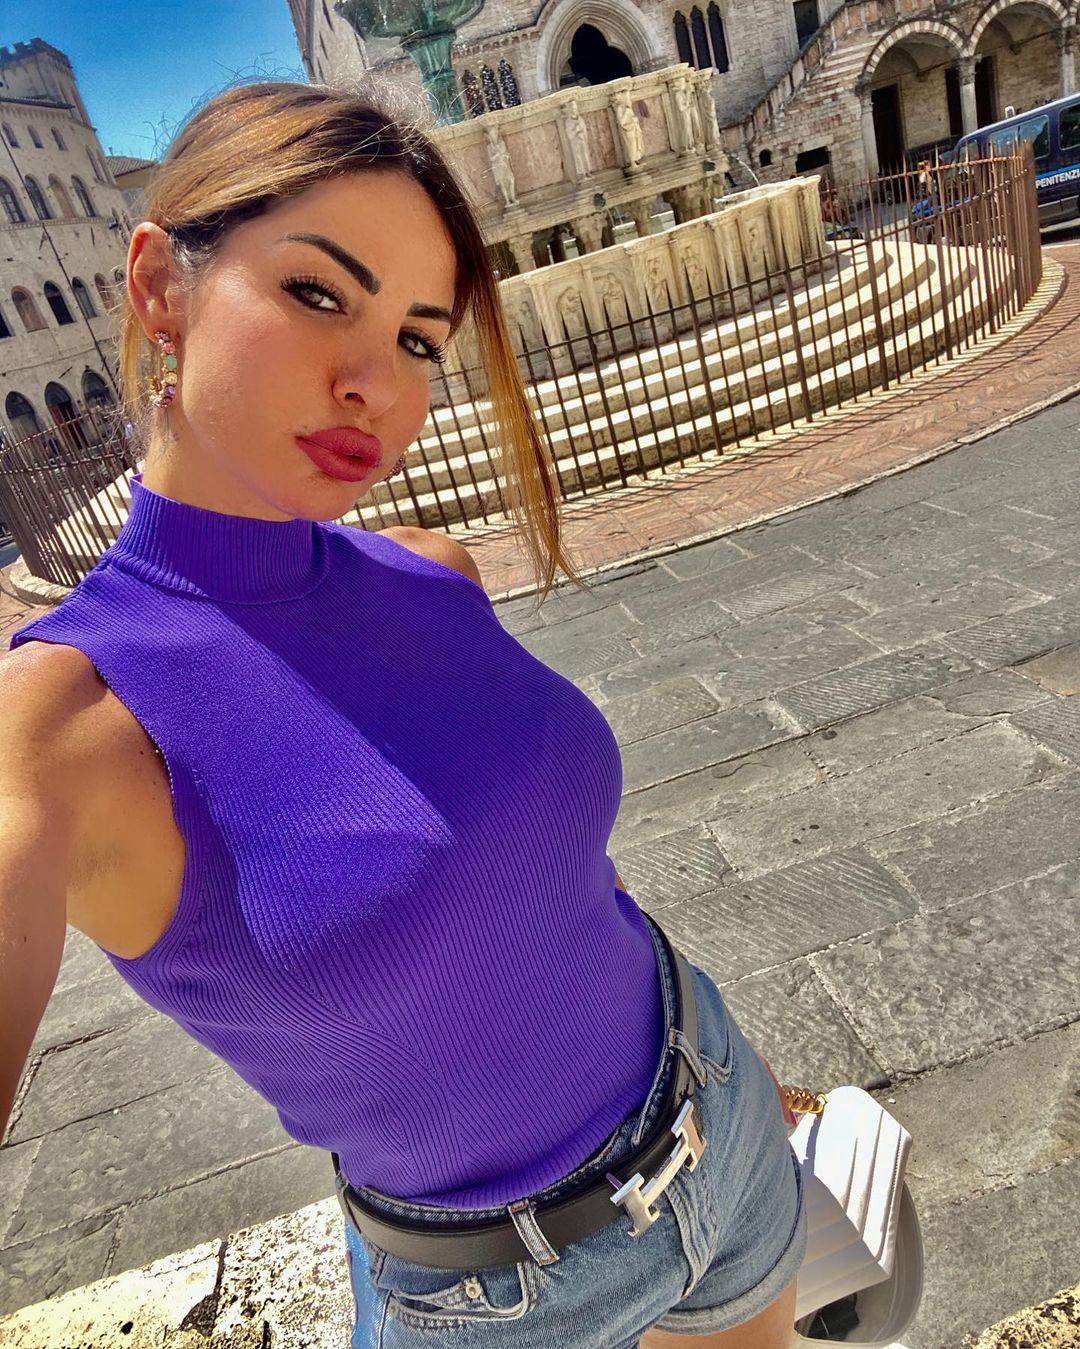 Jessica-Zanazzi-Wallpapers-Insta-Fit-Bio-10